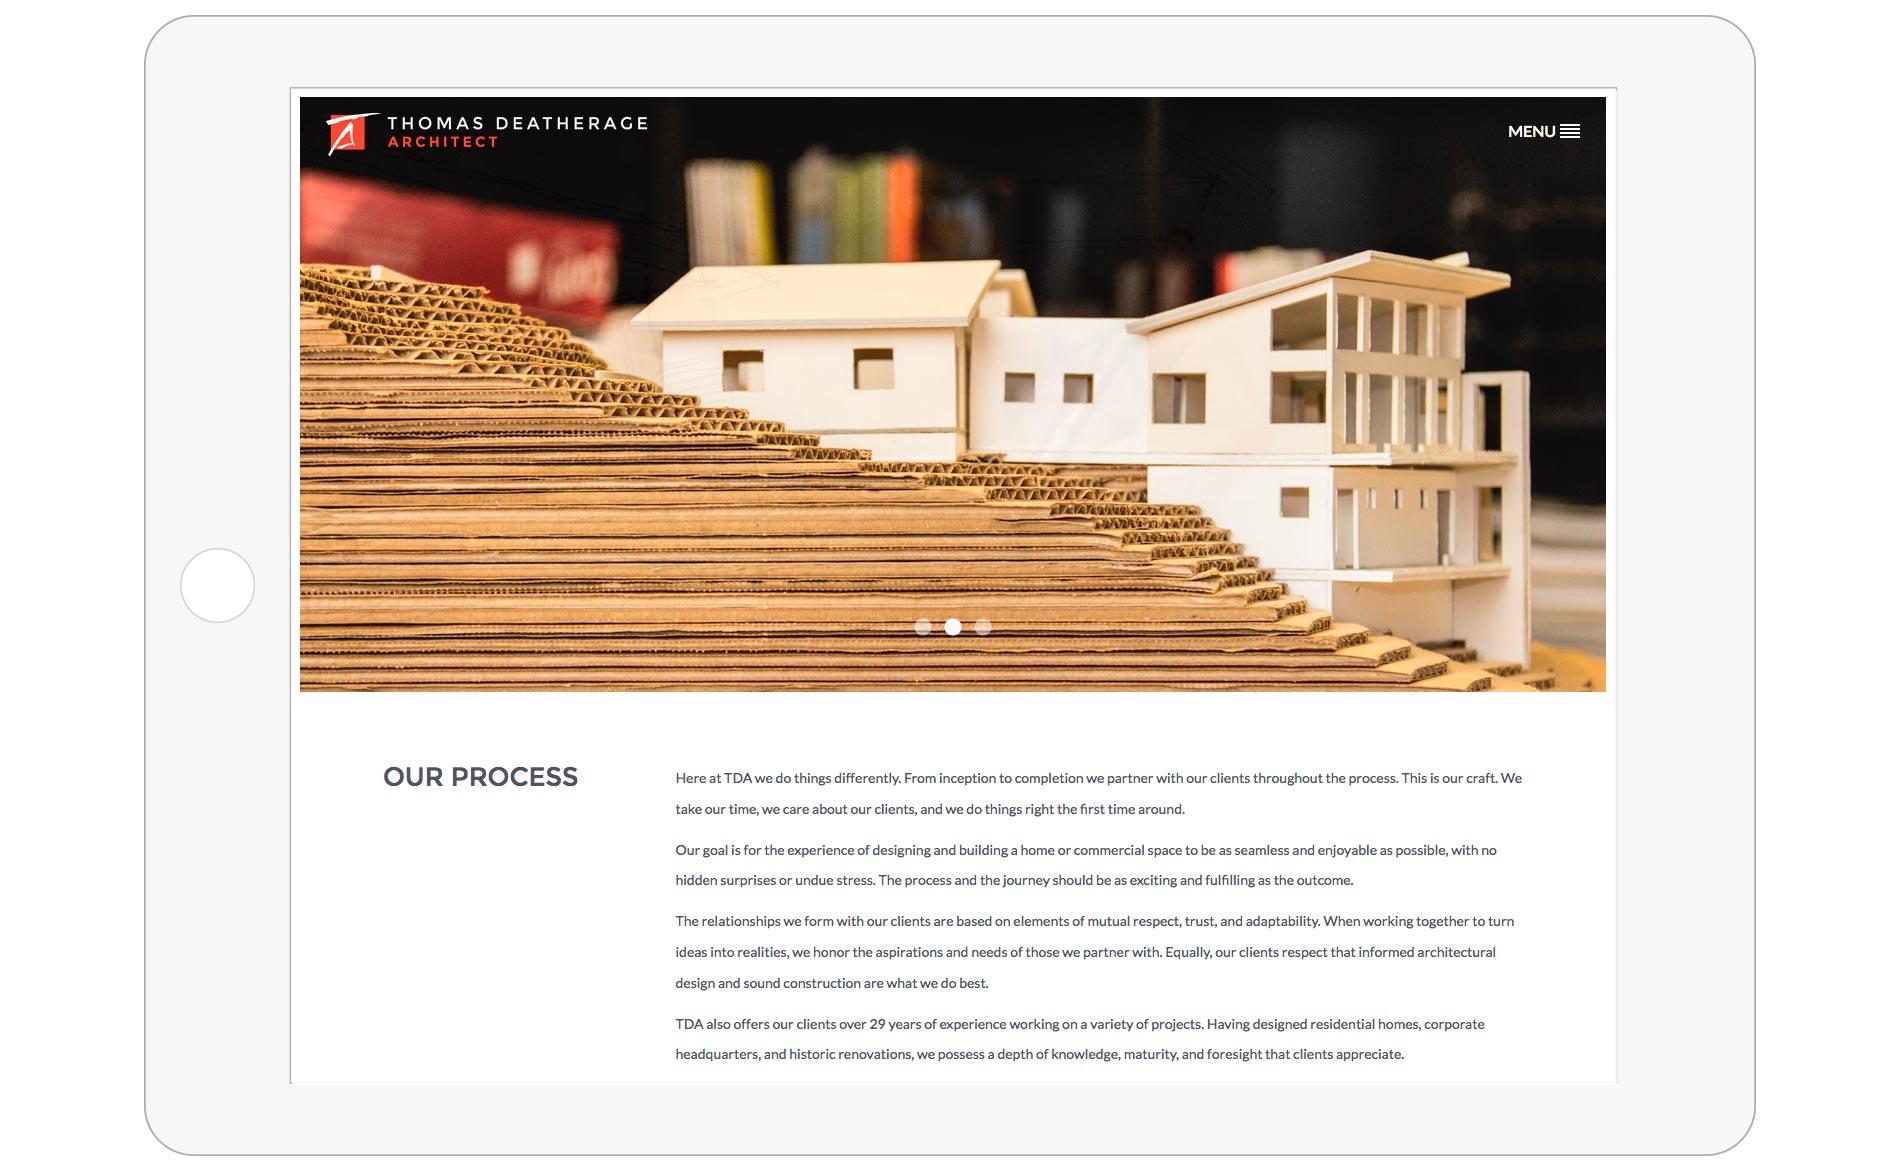 Thomas Deatherage Website Design - Tablet - Process